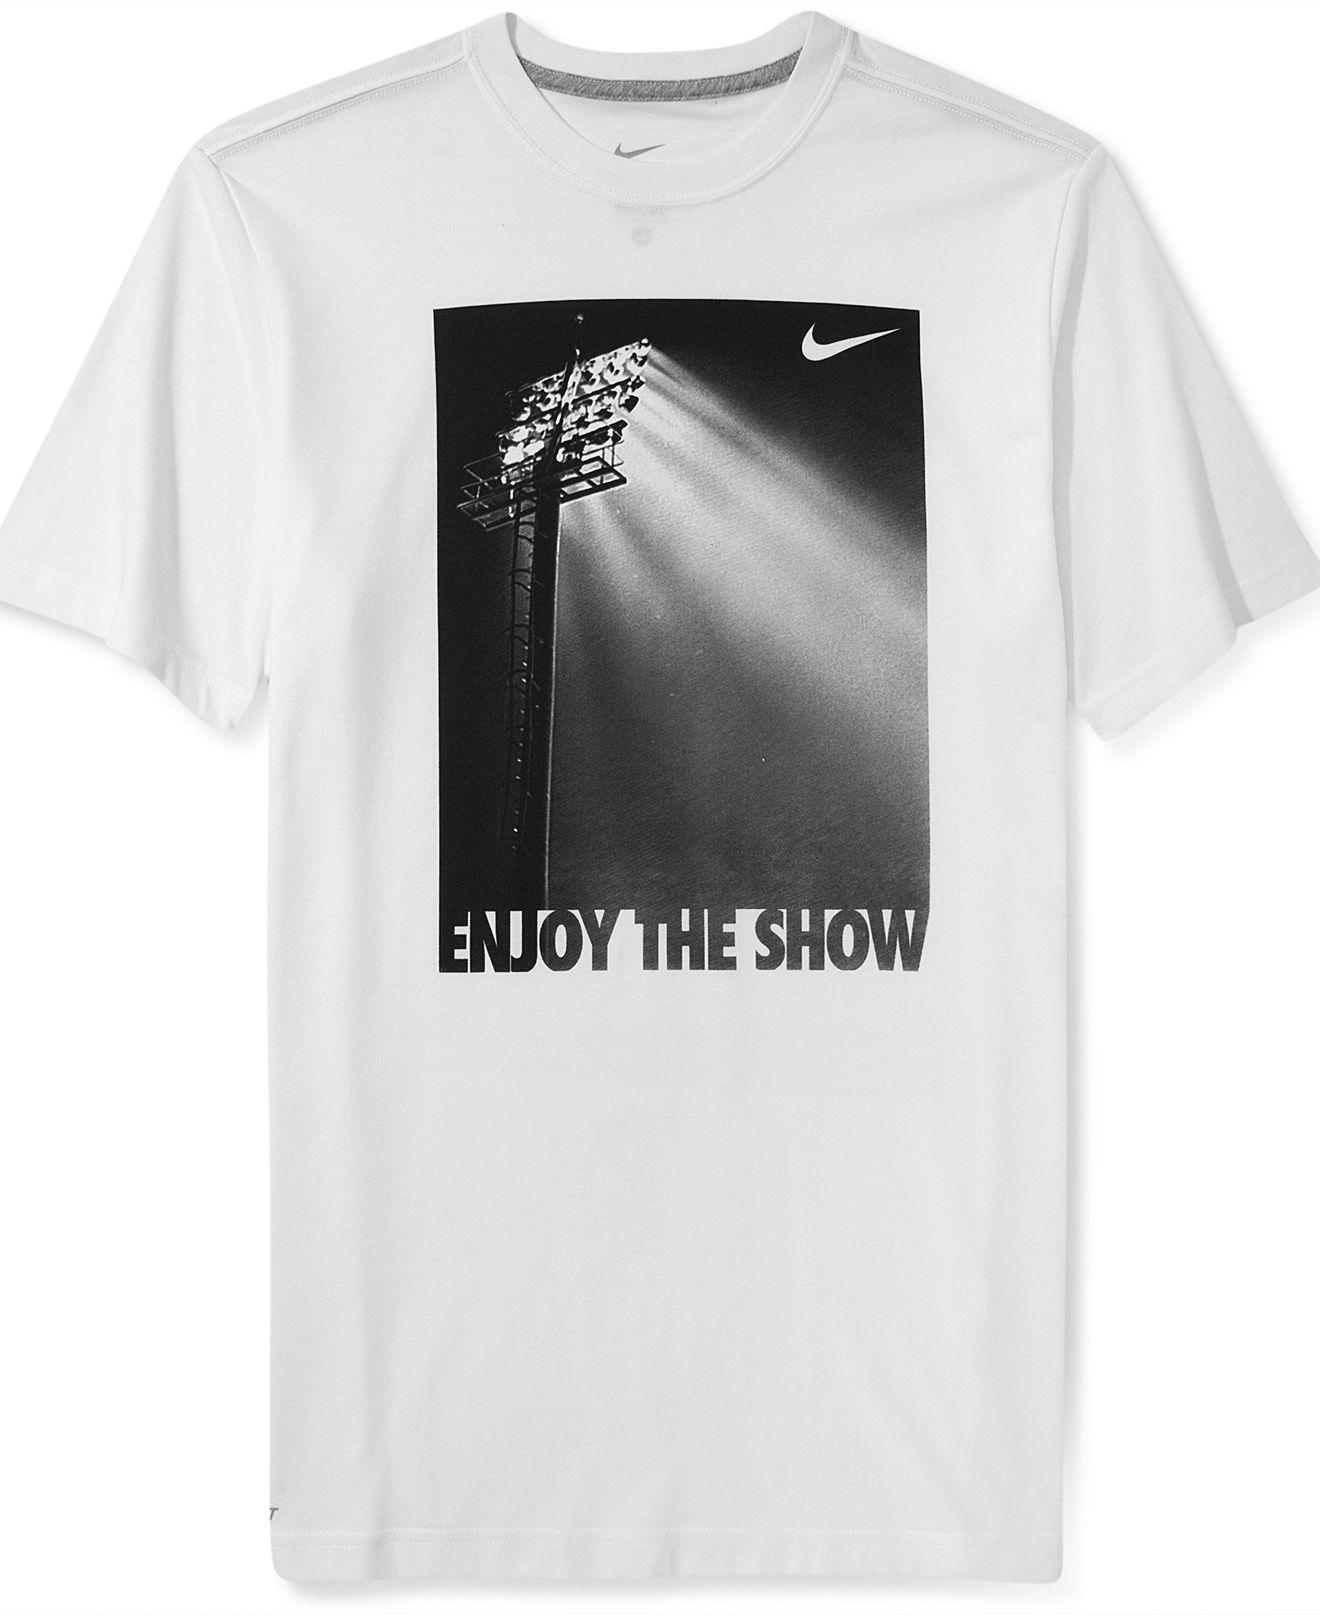 Nike Roshe Courir Pour Femmes Graphiques T-shirts